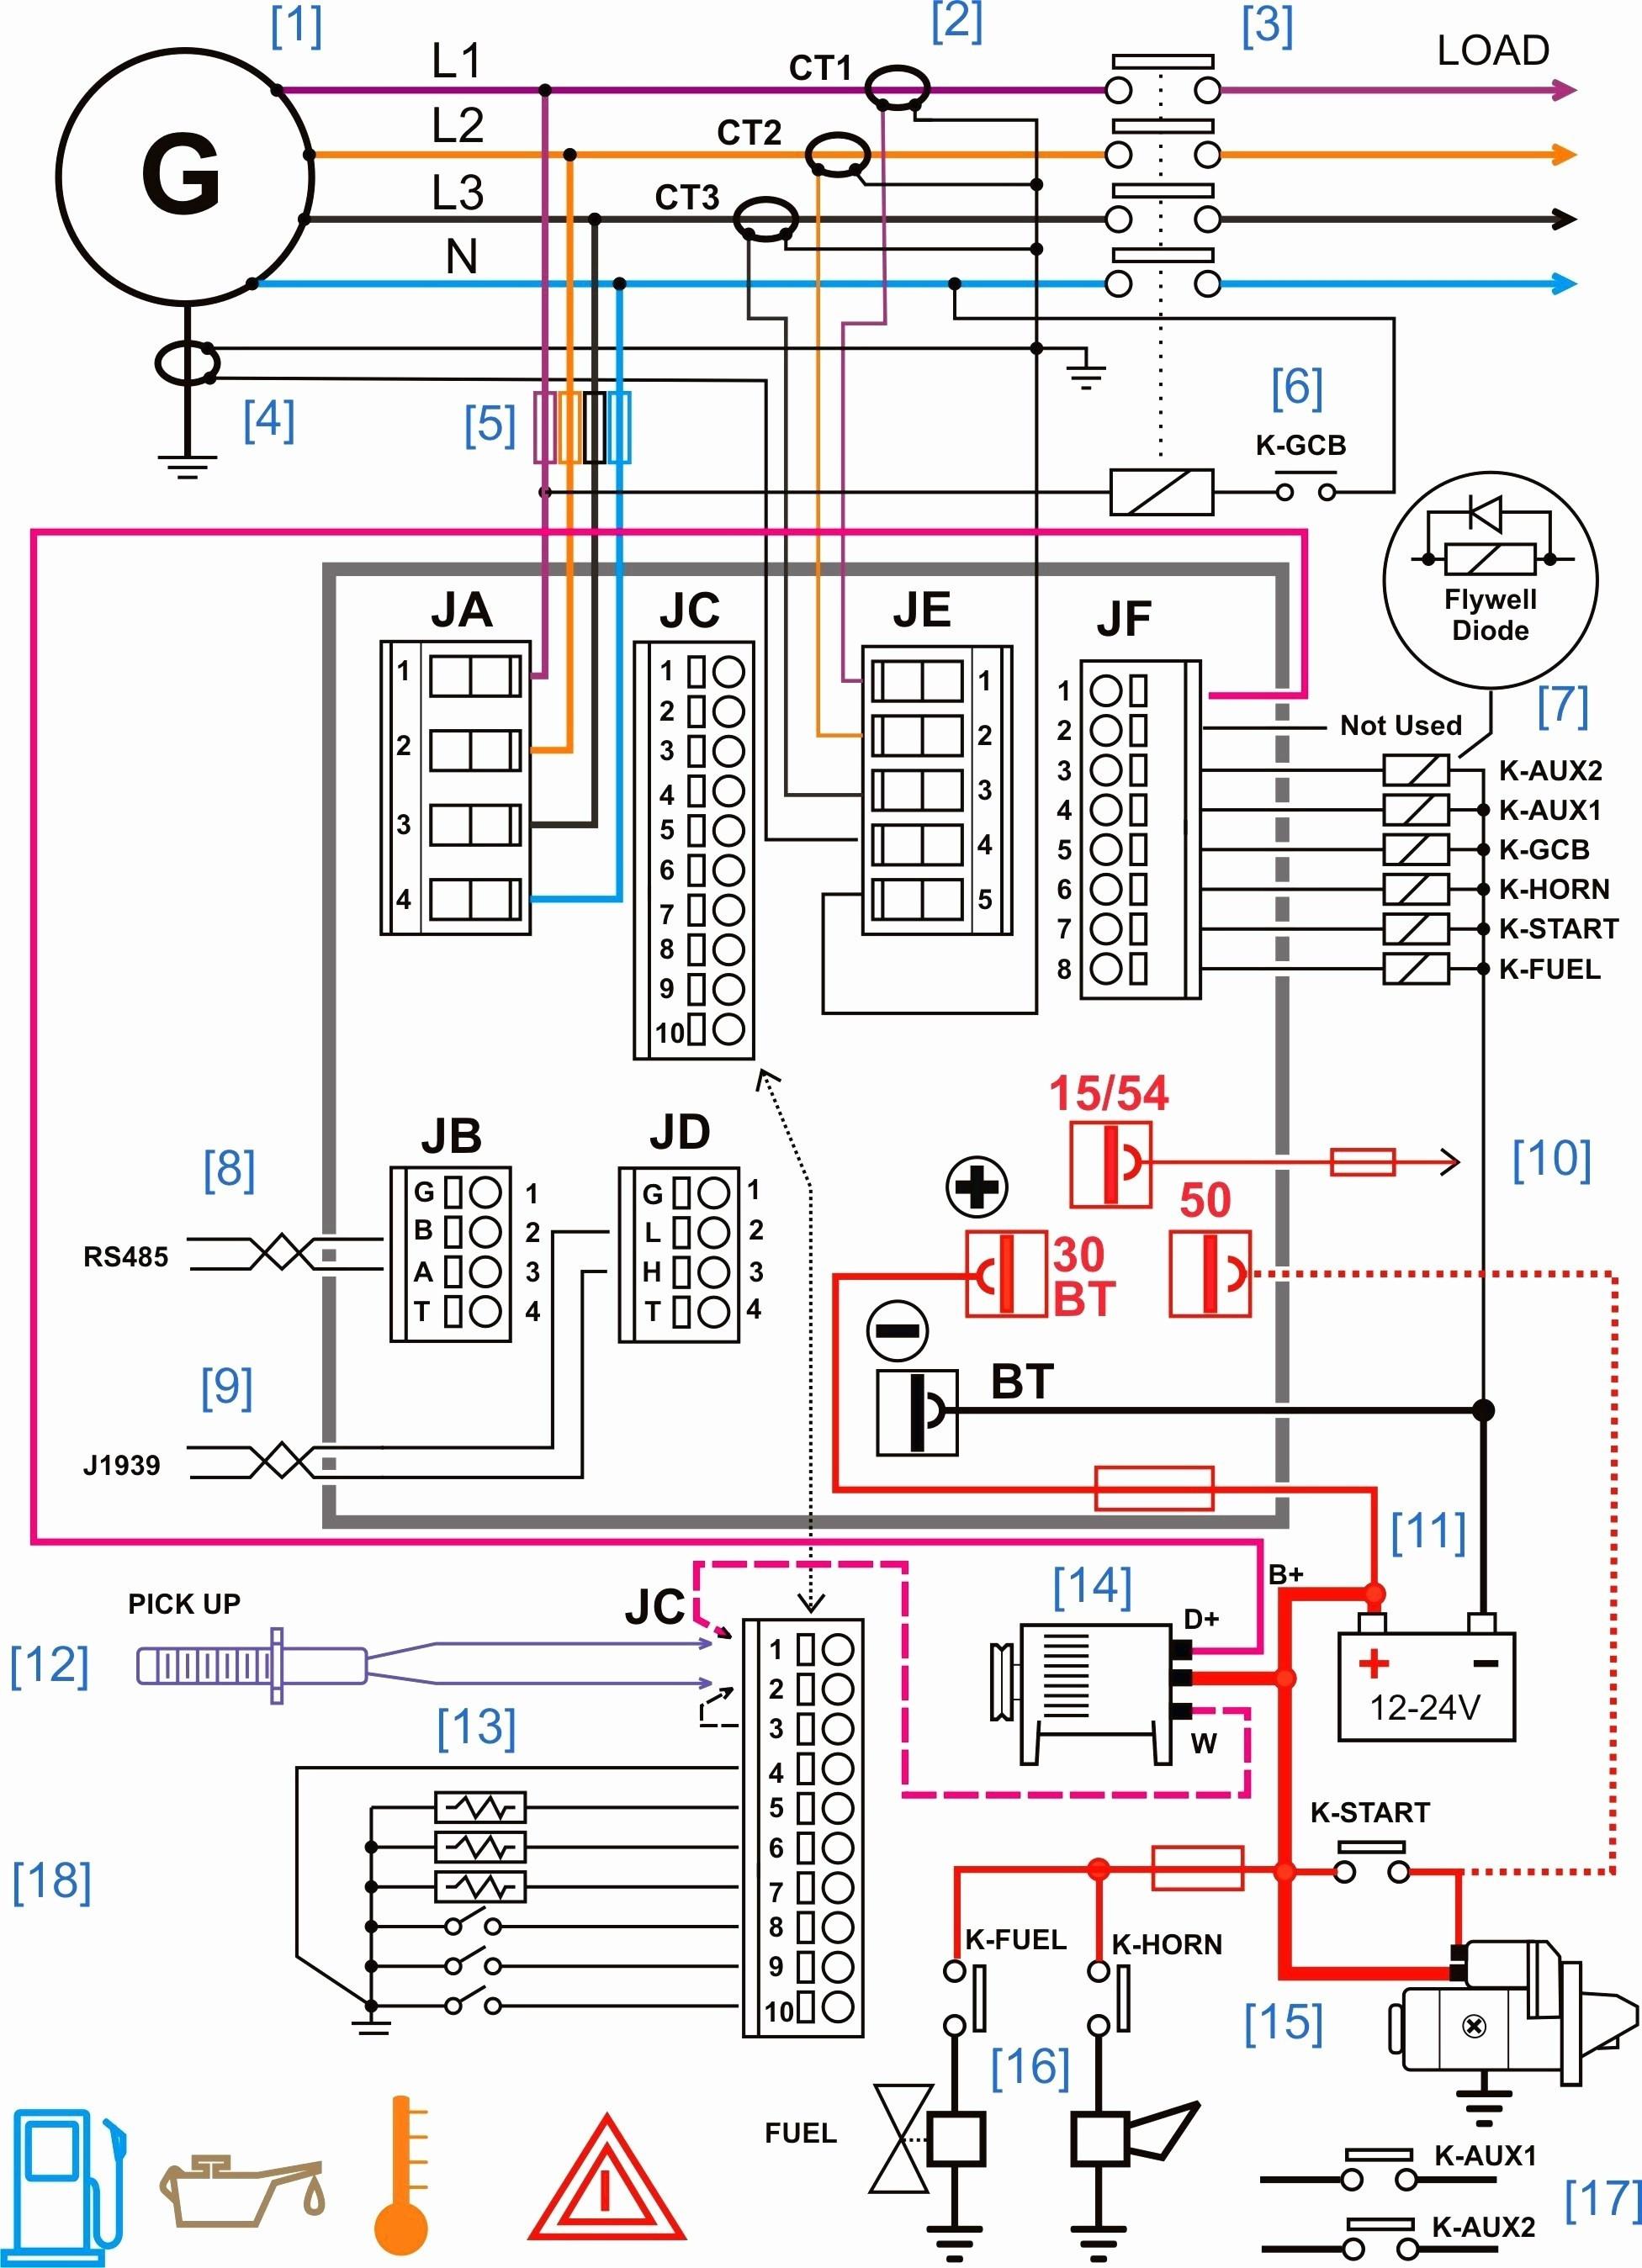 Ooma Wiring Diagram